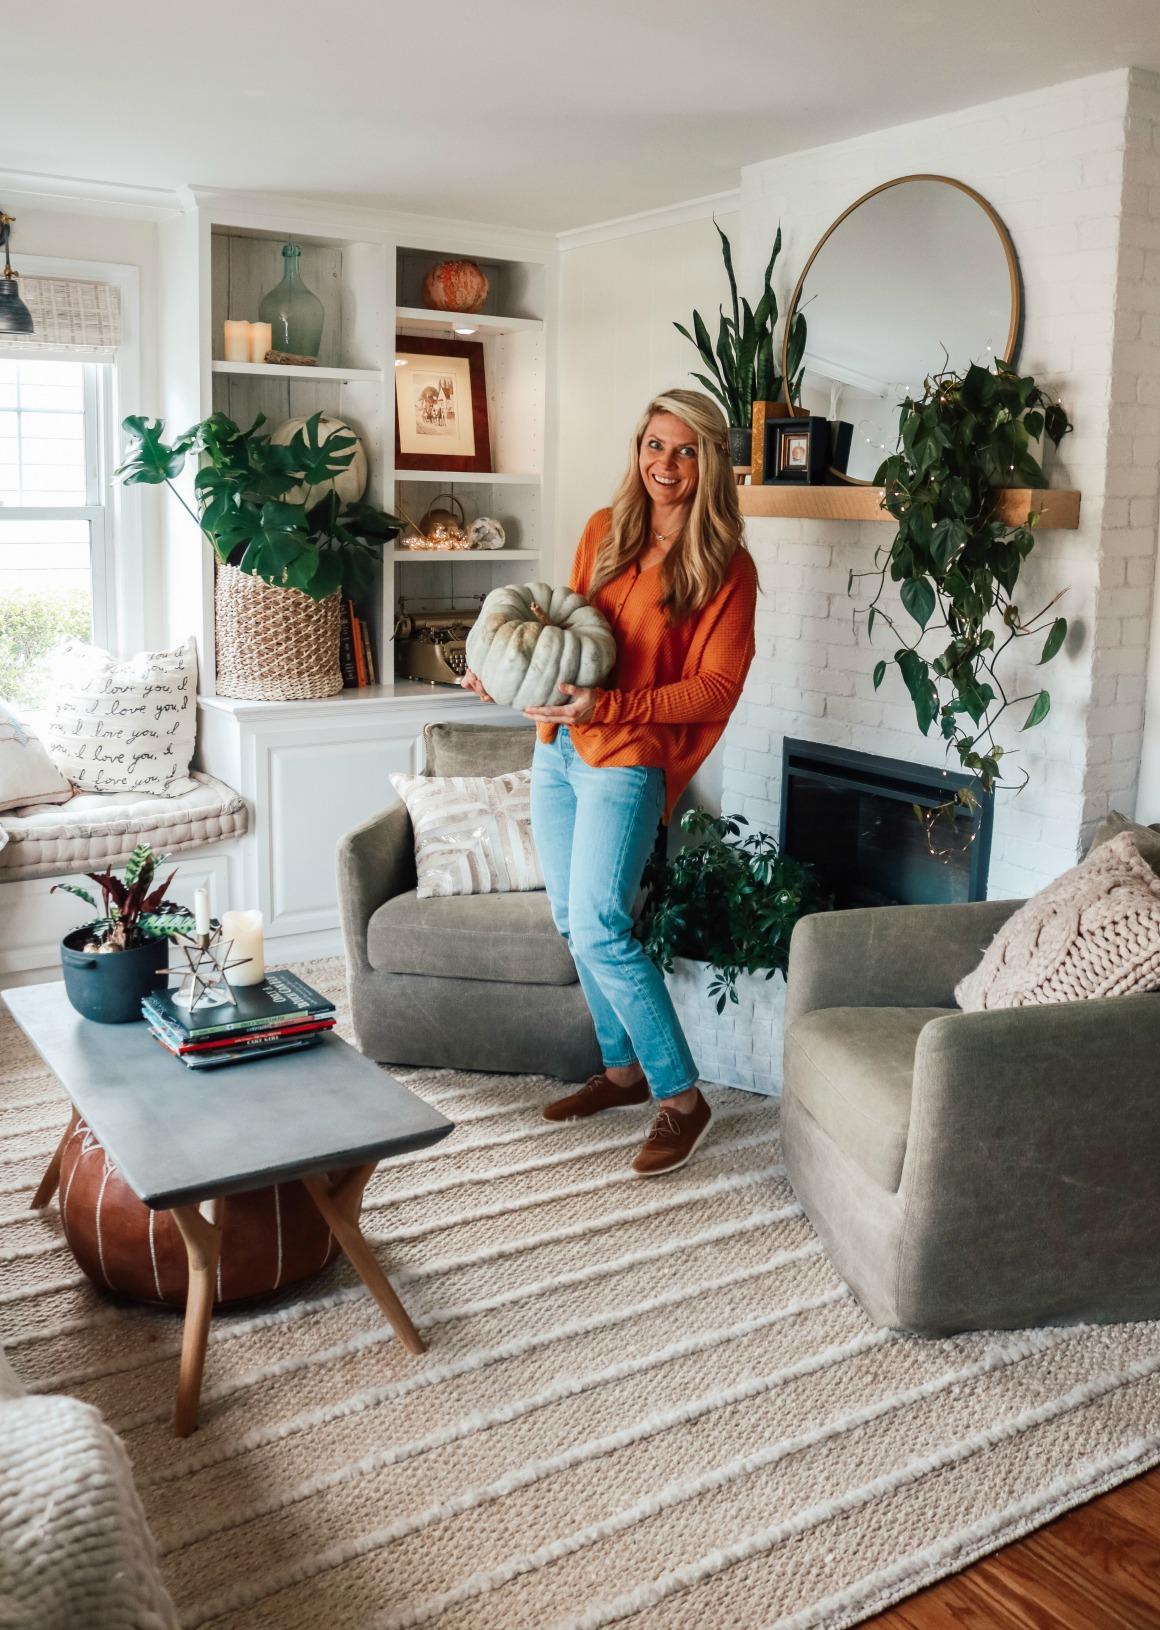 2019 Fall Home Decor Trends vs Fall Fashion Trends - Nesting ...